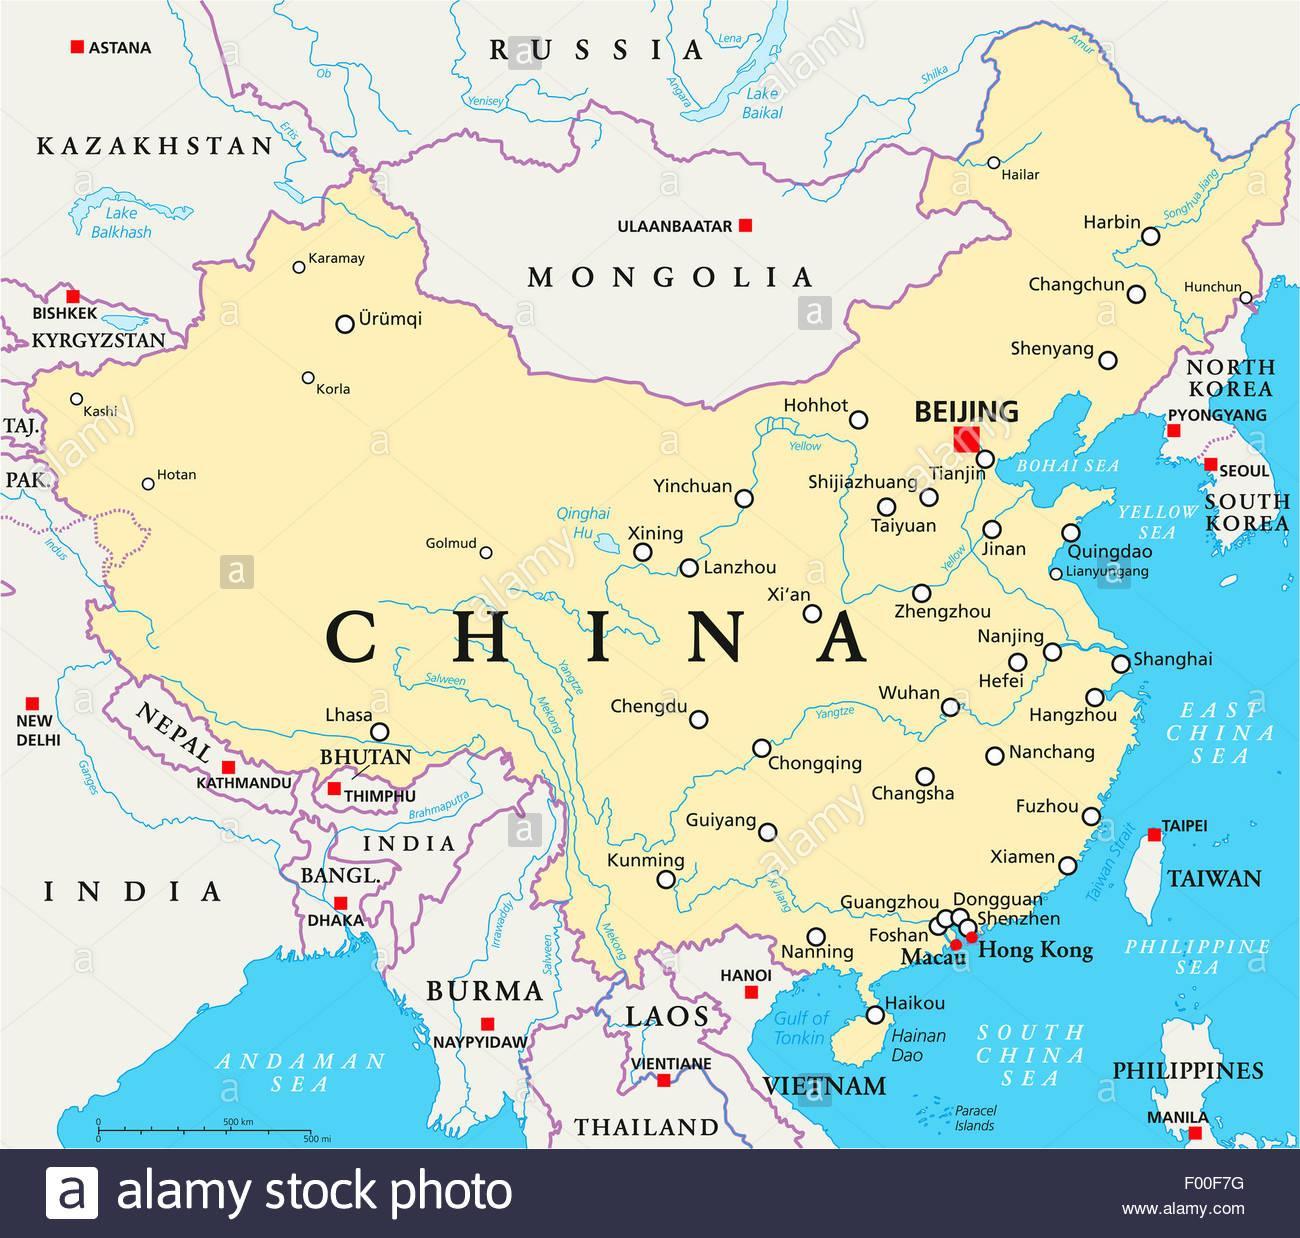 karta kina Floder i Kina karta   Karta Kina floder (Östra asien   Asien) karta kina